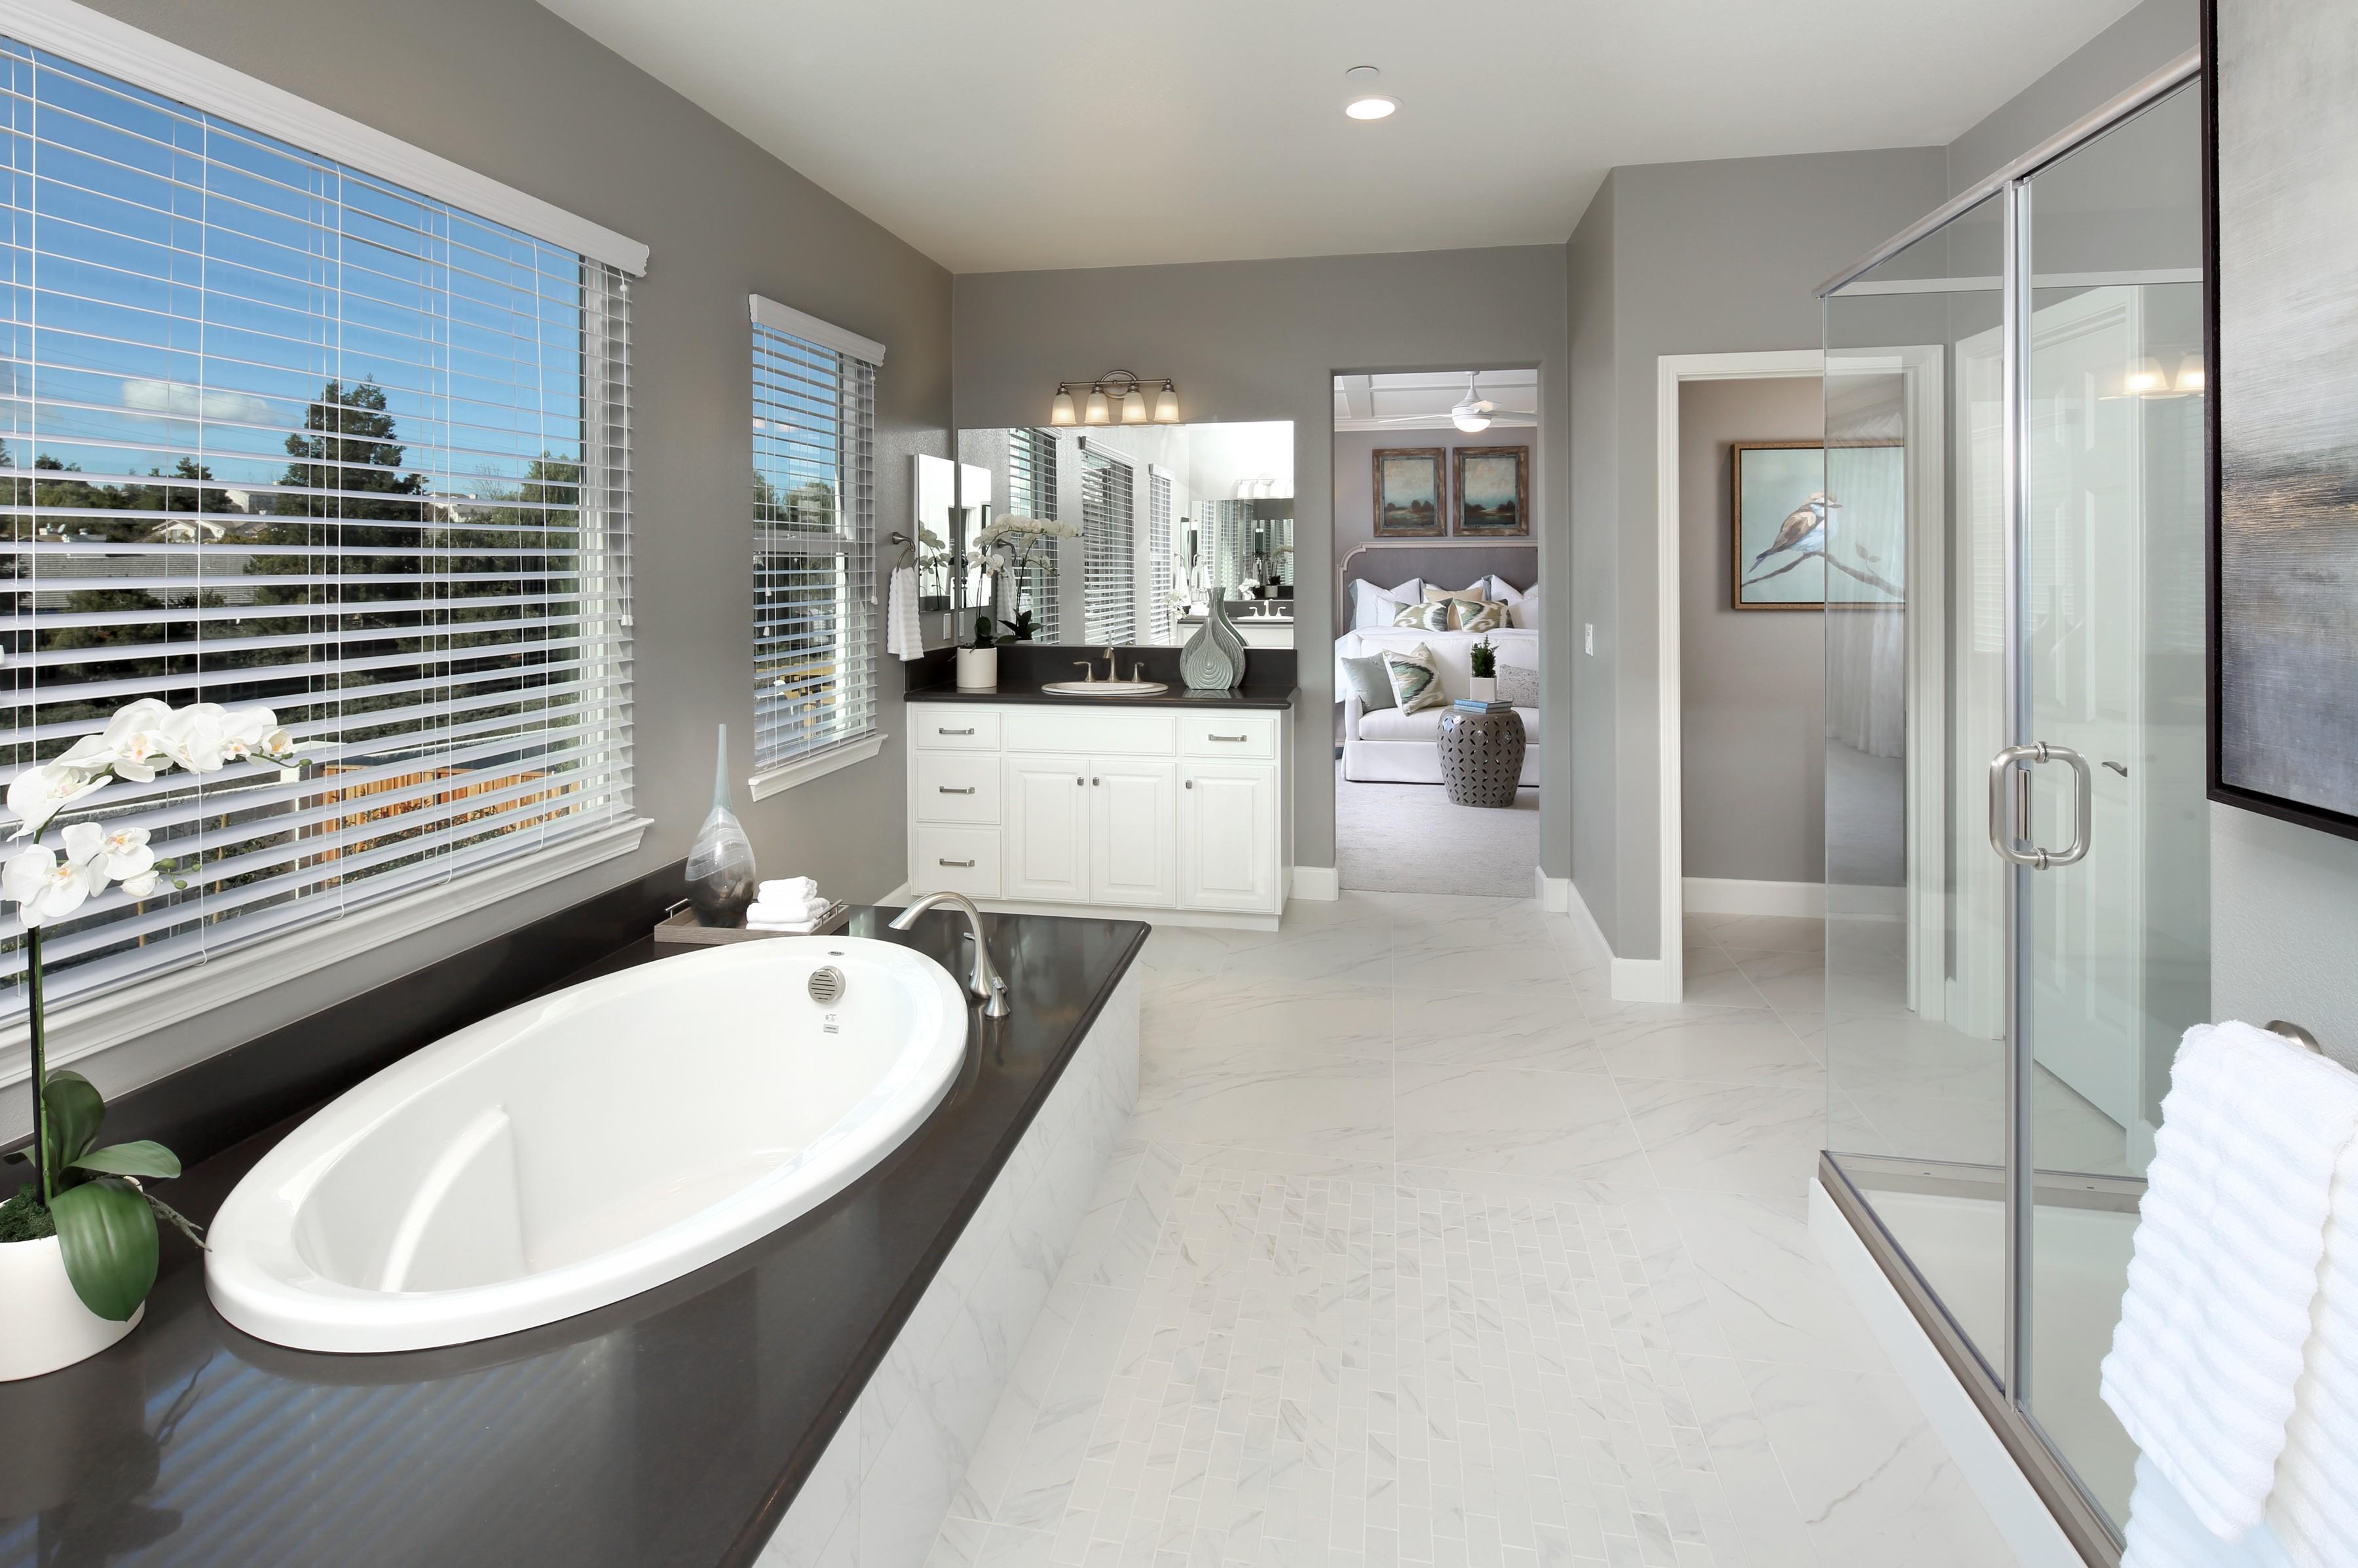 Bathroom Tiles Designs   Elite Builder Services